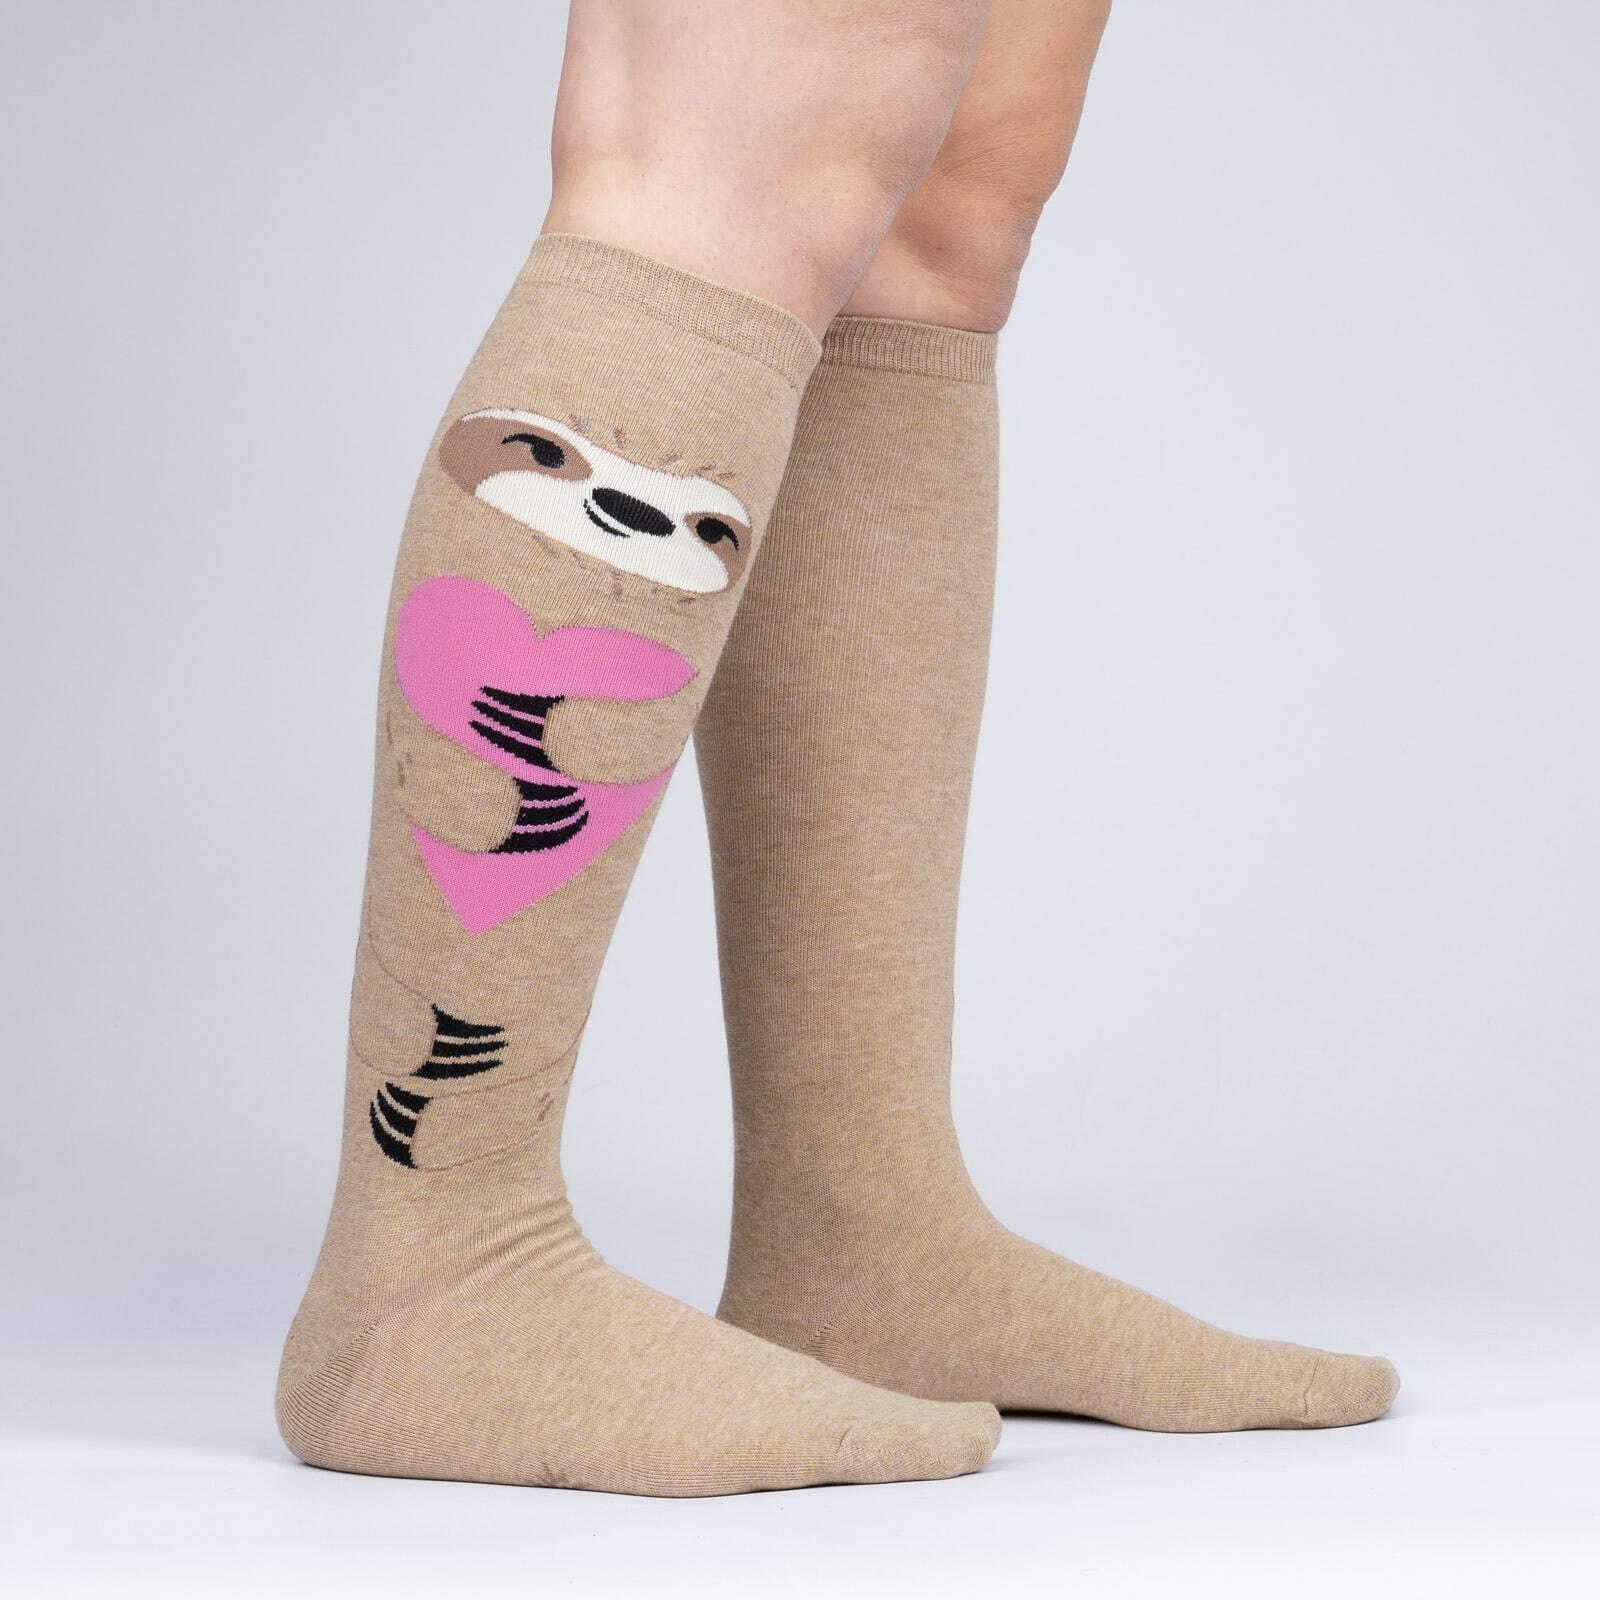 model side view of A Long Slow Hug - Heathered Sloth Socks - Women's